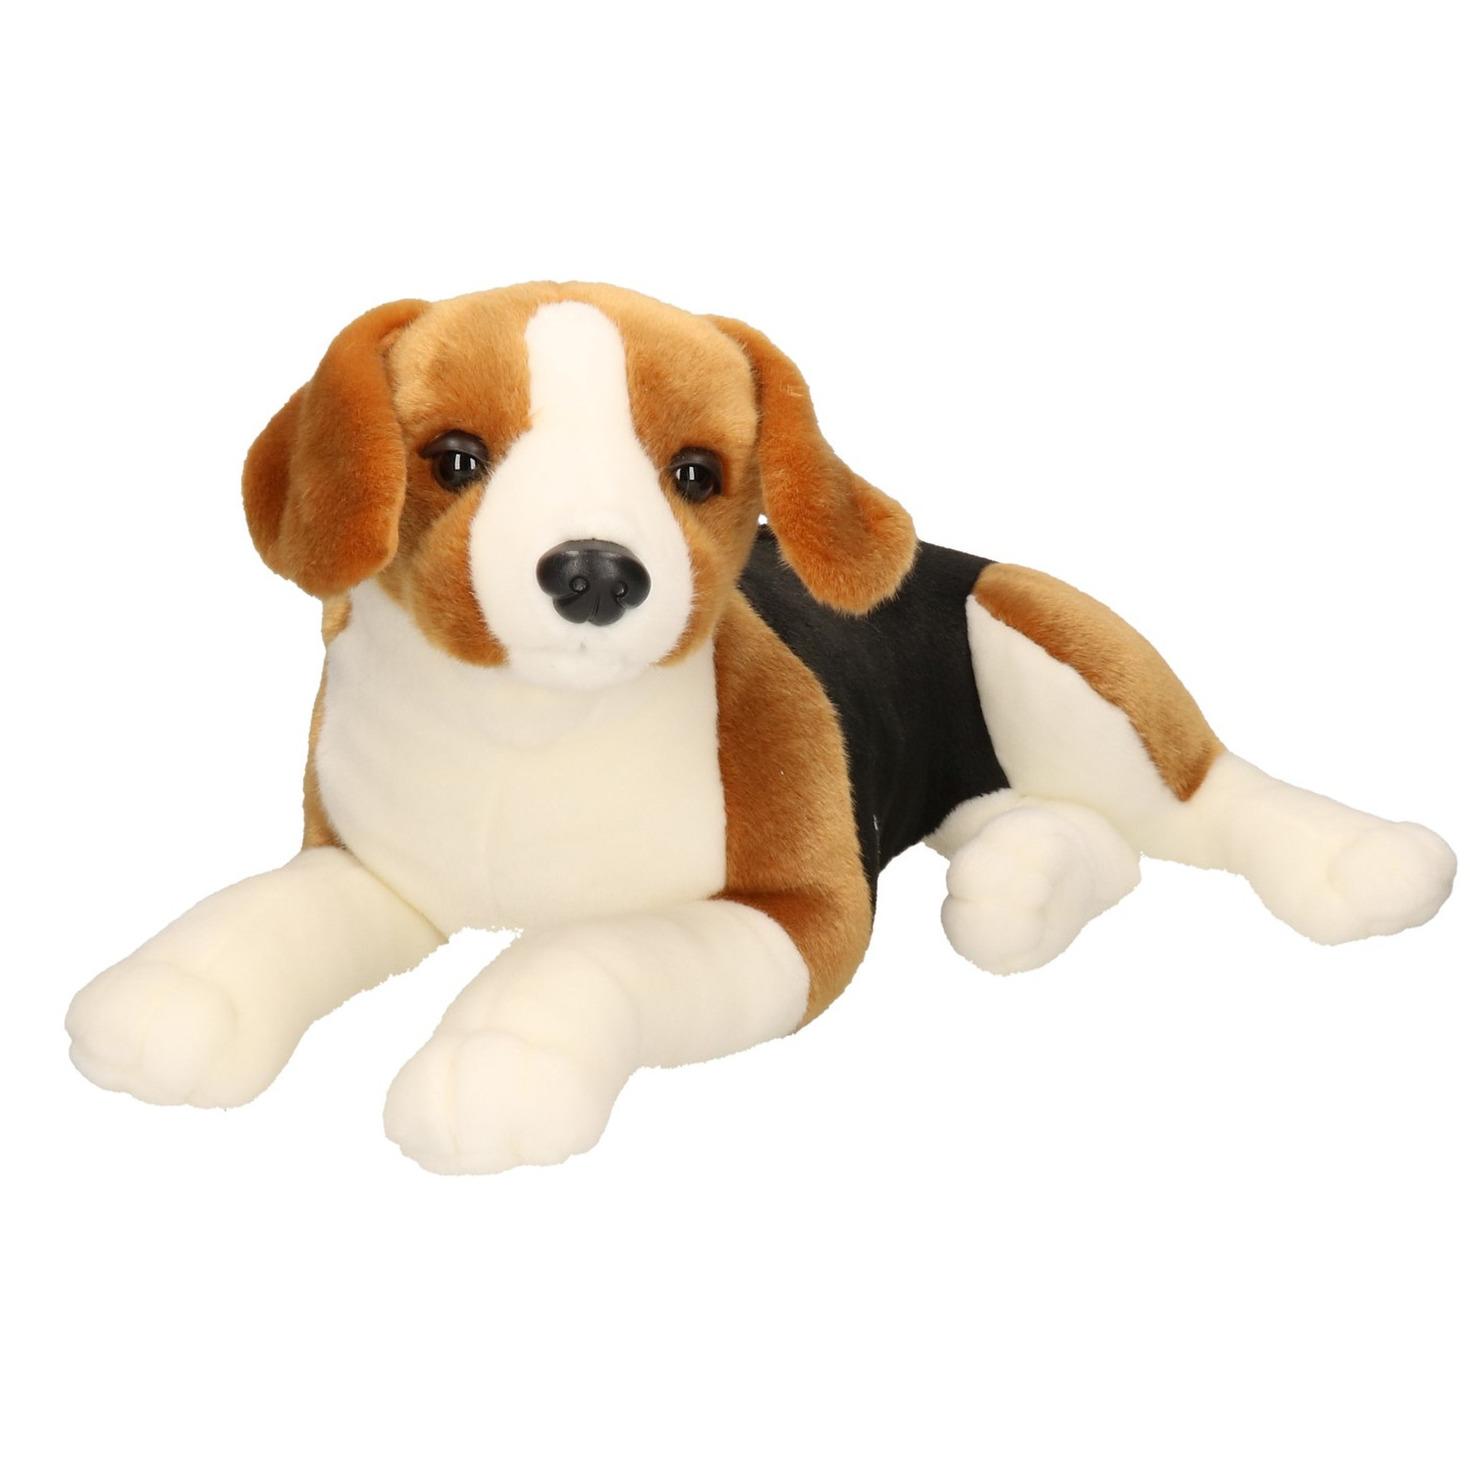 Honden speelgoed artikelen Beagle knuffelbeest bruin/zwart 53 cm